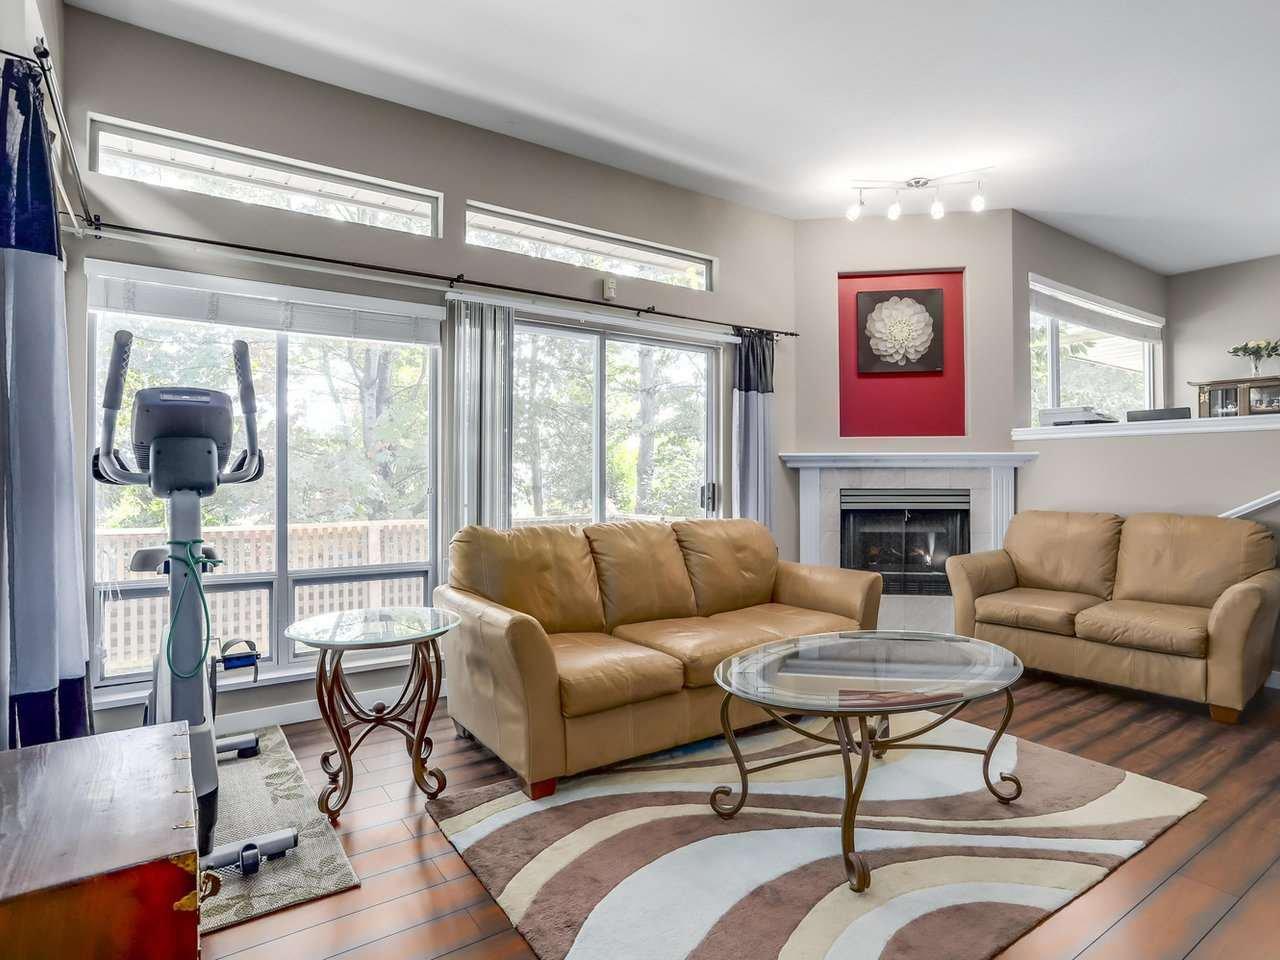 "Main Photo: 39 5380 SMITH Drive in Richmond: Hamilton RI Townhouse for sale in ""BRIDGEVIEW COURT"" : MLS®# R2309223"